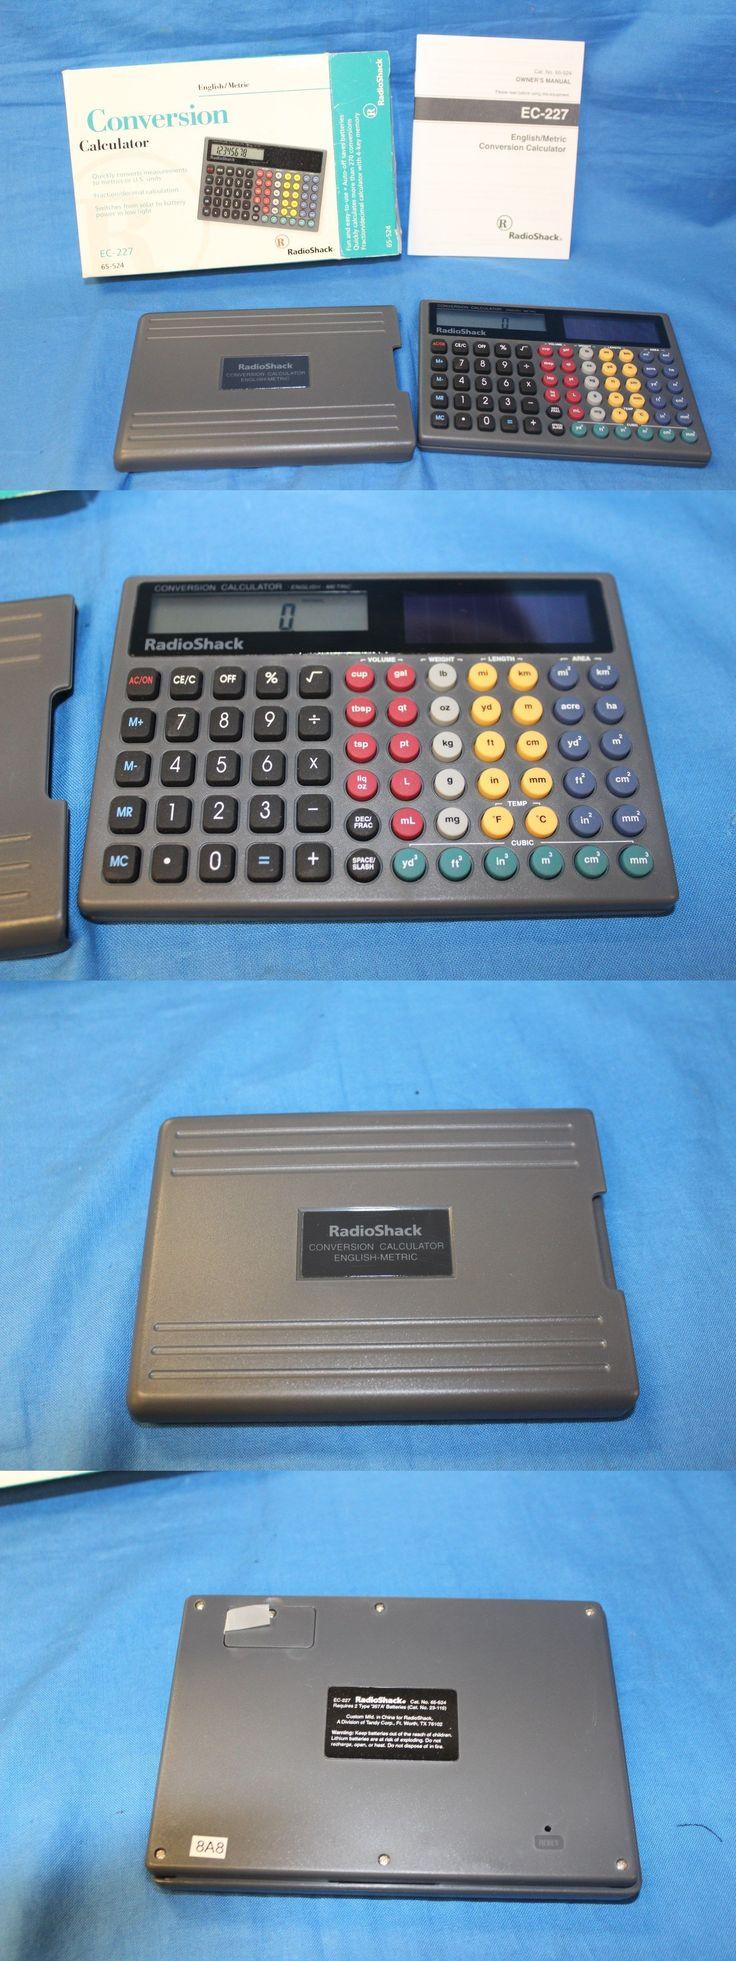 Calculators: Radioshack Metric Conversion Calculator Solar To Battery. English Metric. -> BUY IT NOW ONLY: $39.94 on eBay!